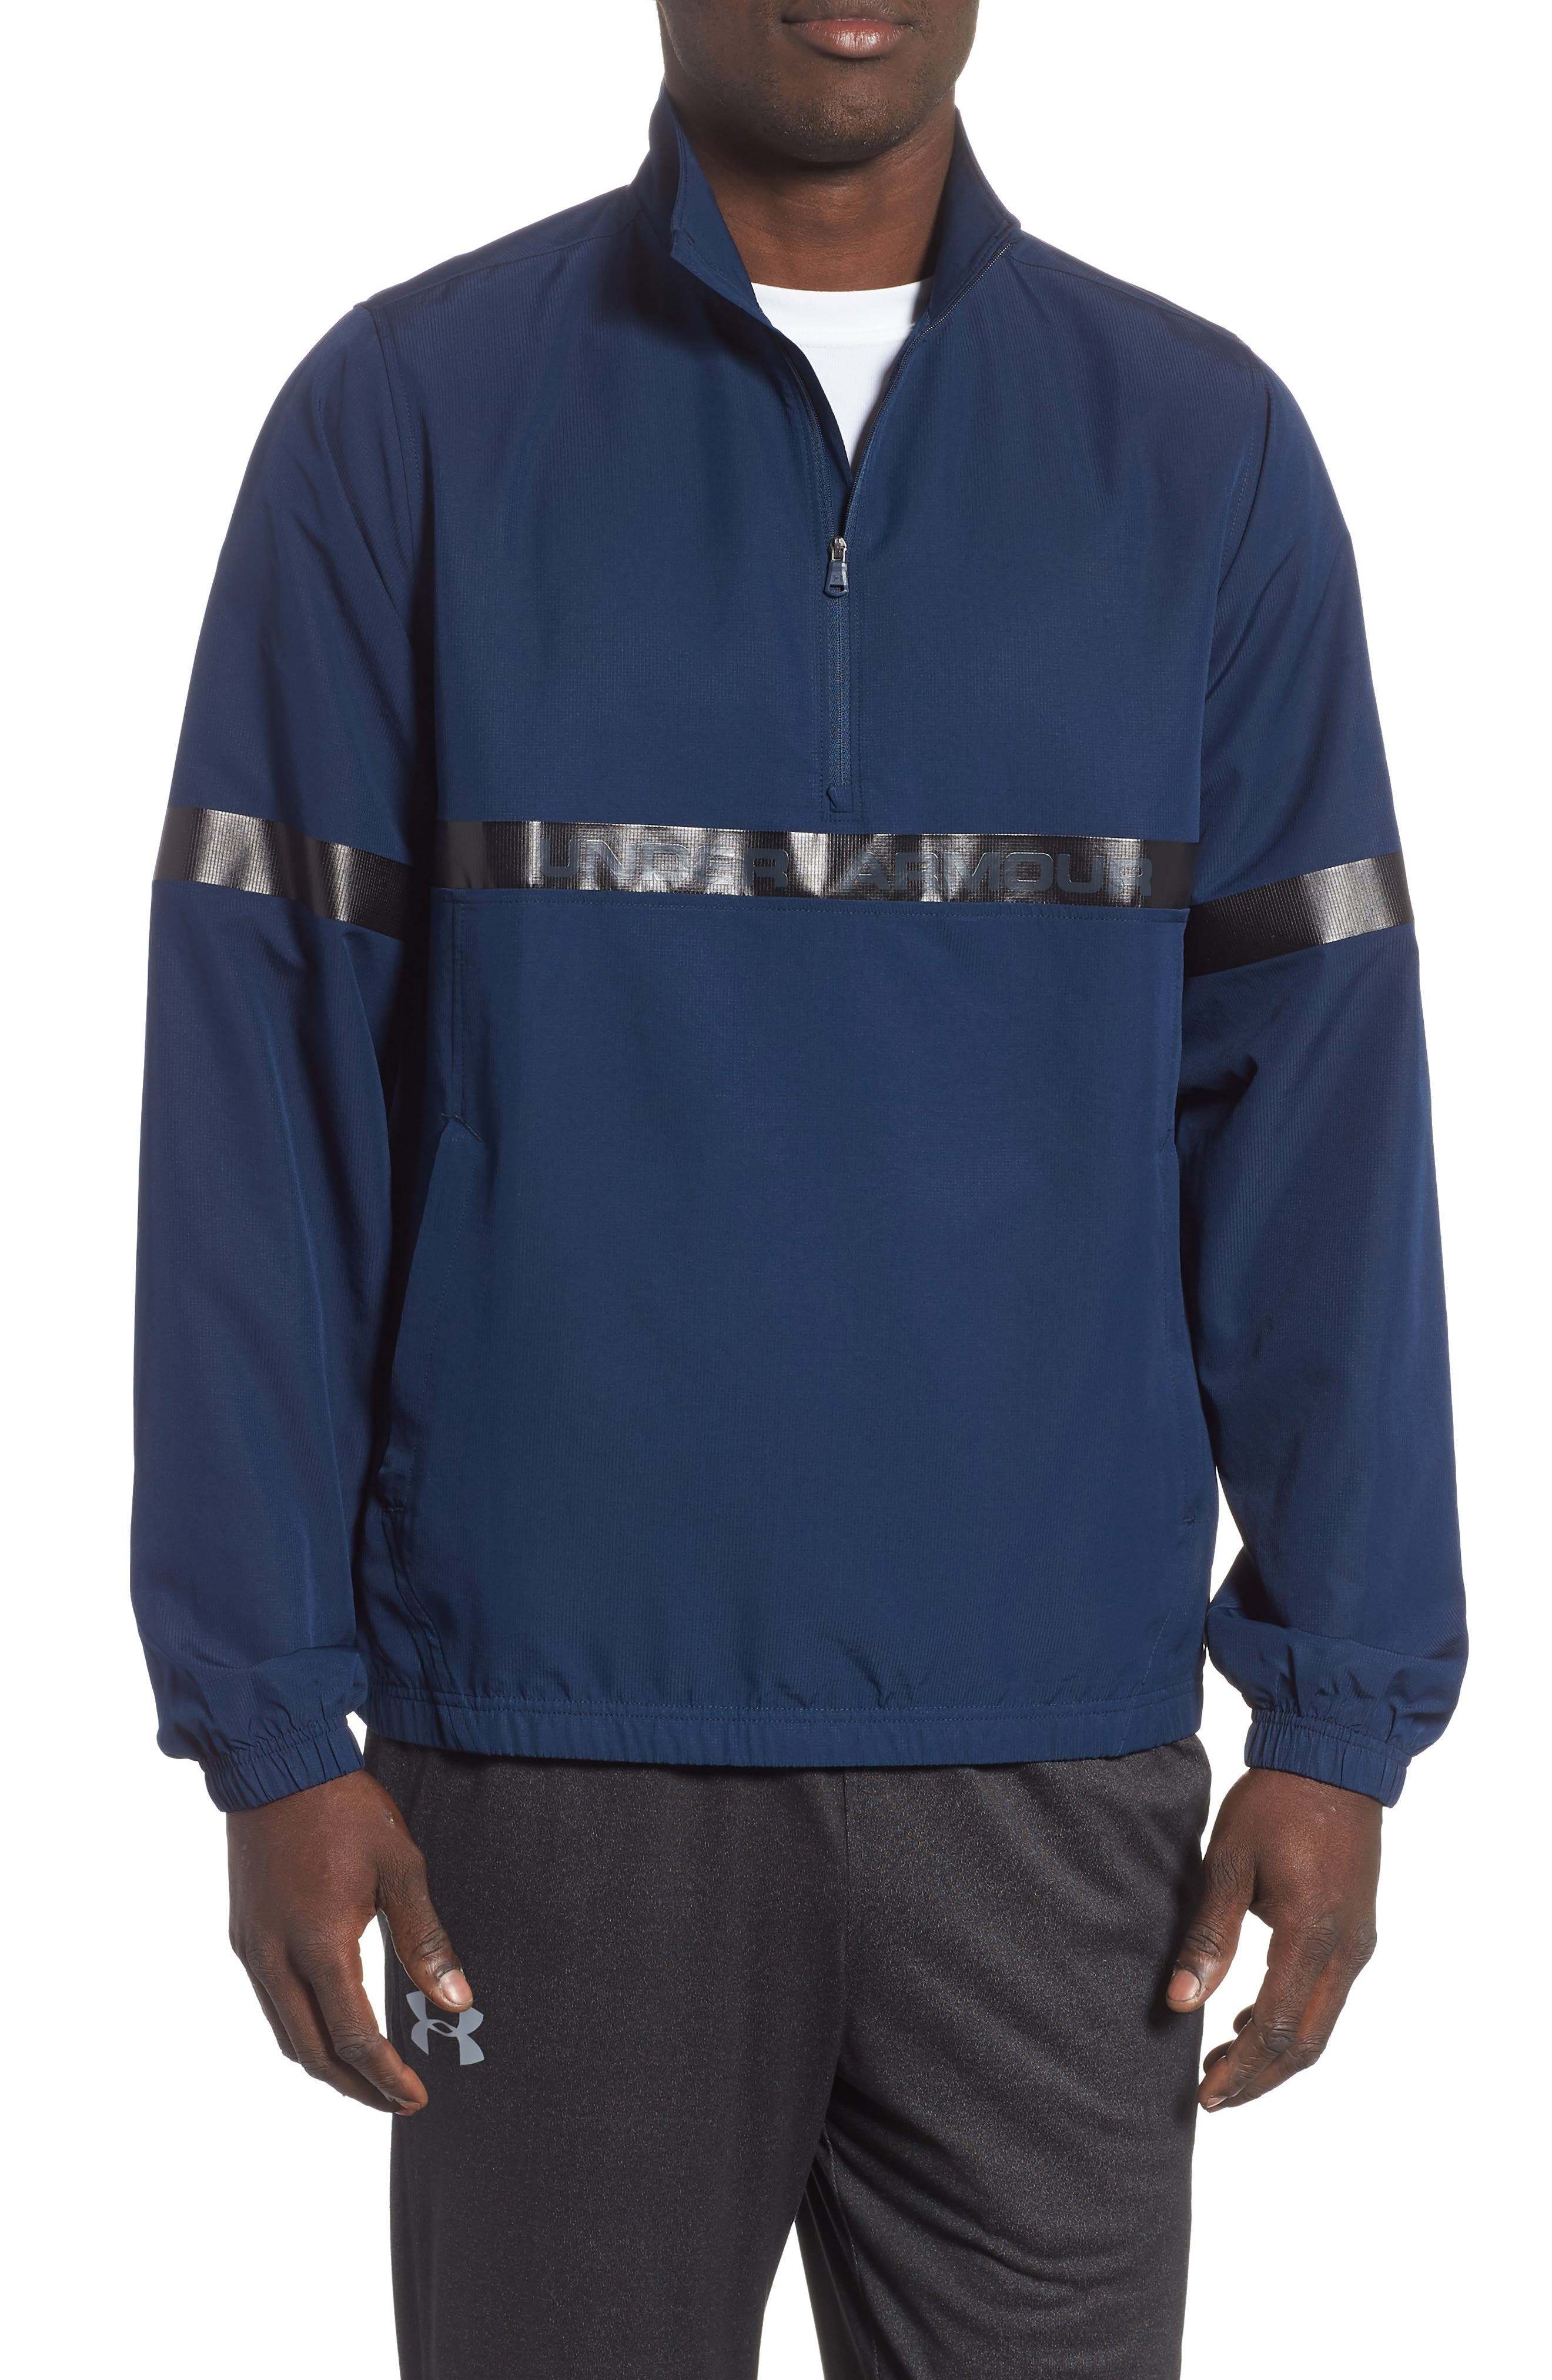 Under Armour Sportstyle Half Zip Pullover, Blue